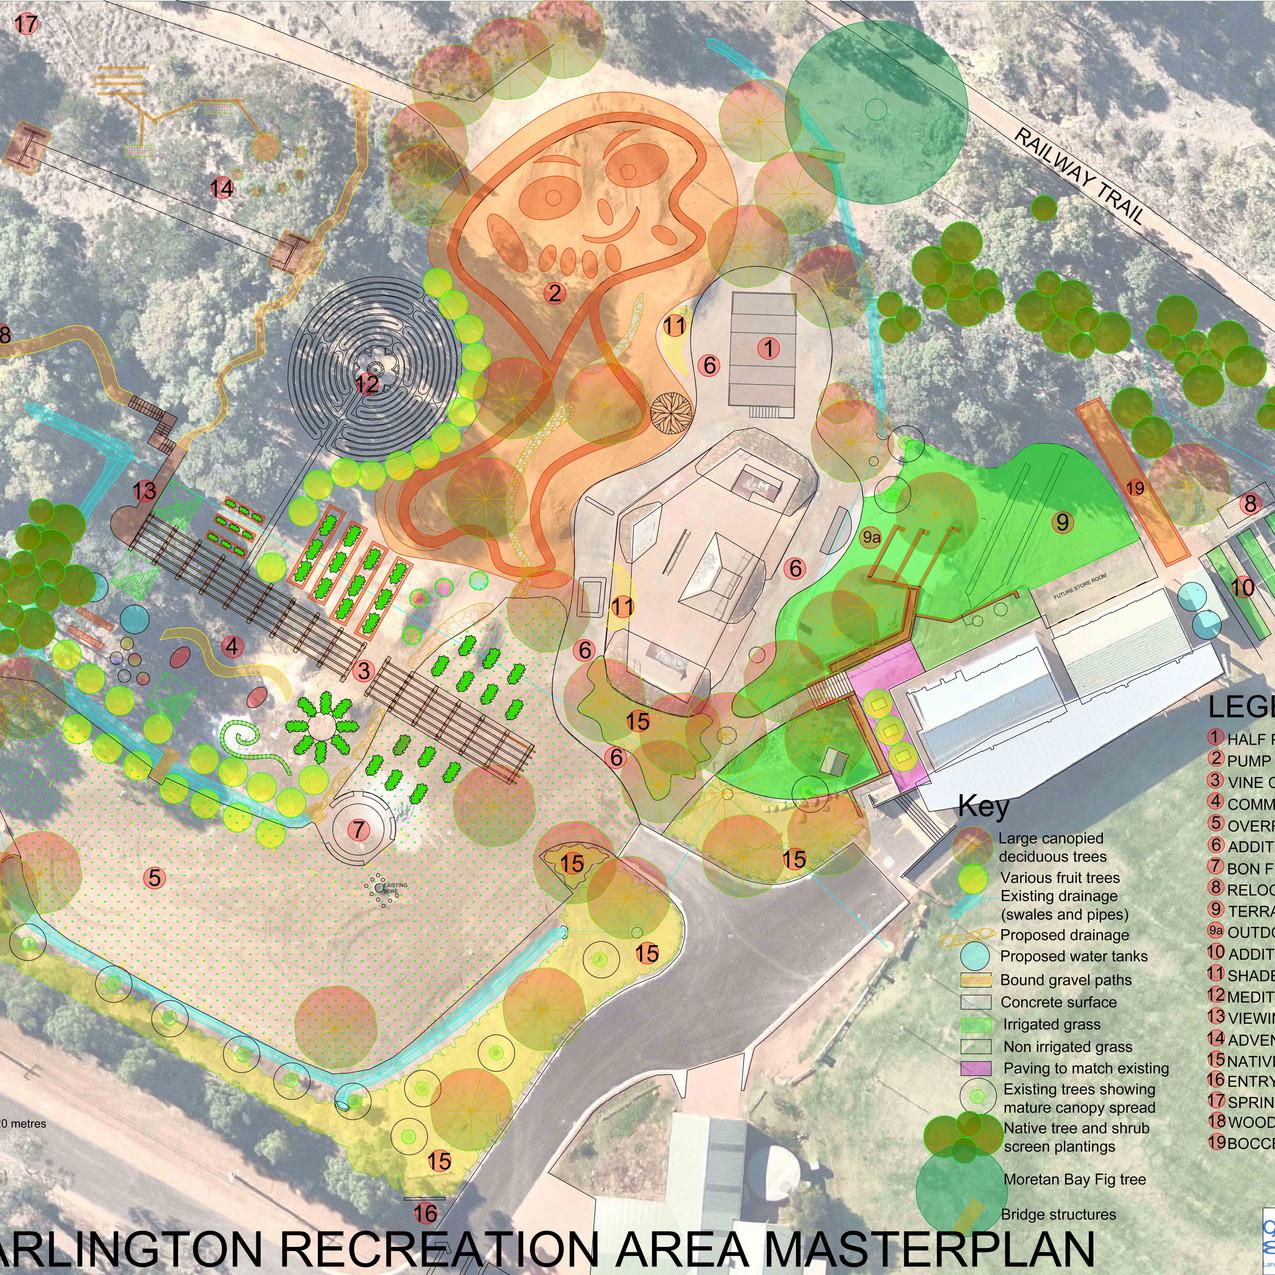 Darlo Rec area masterplan small